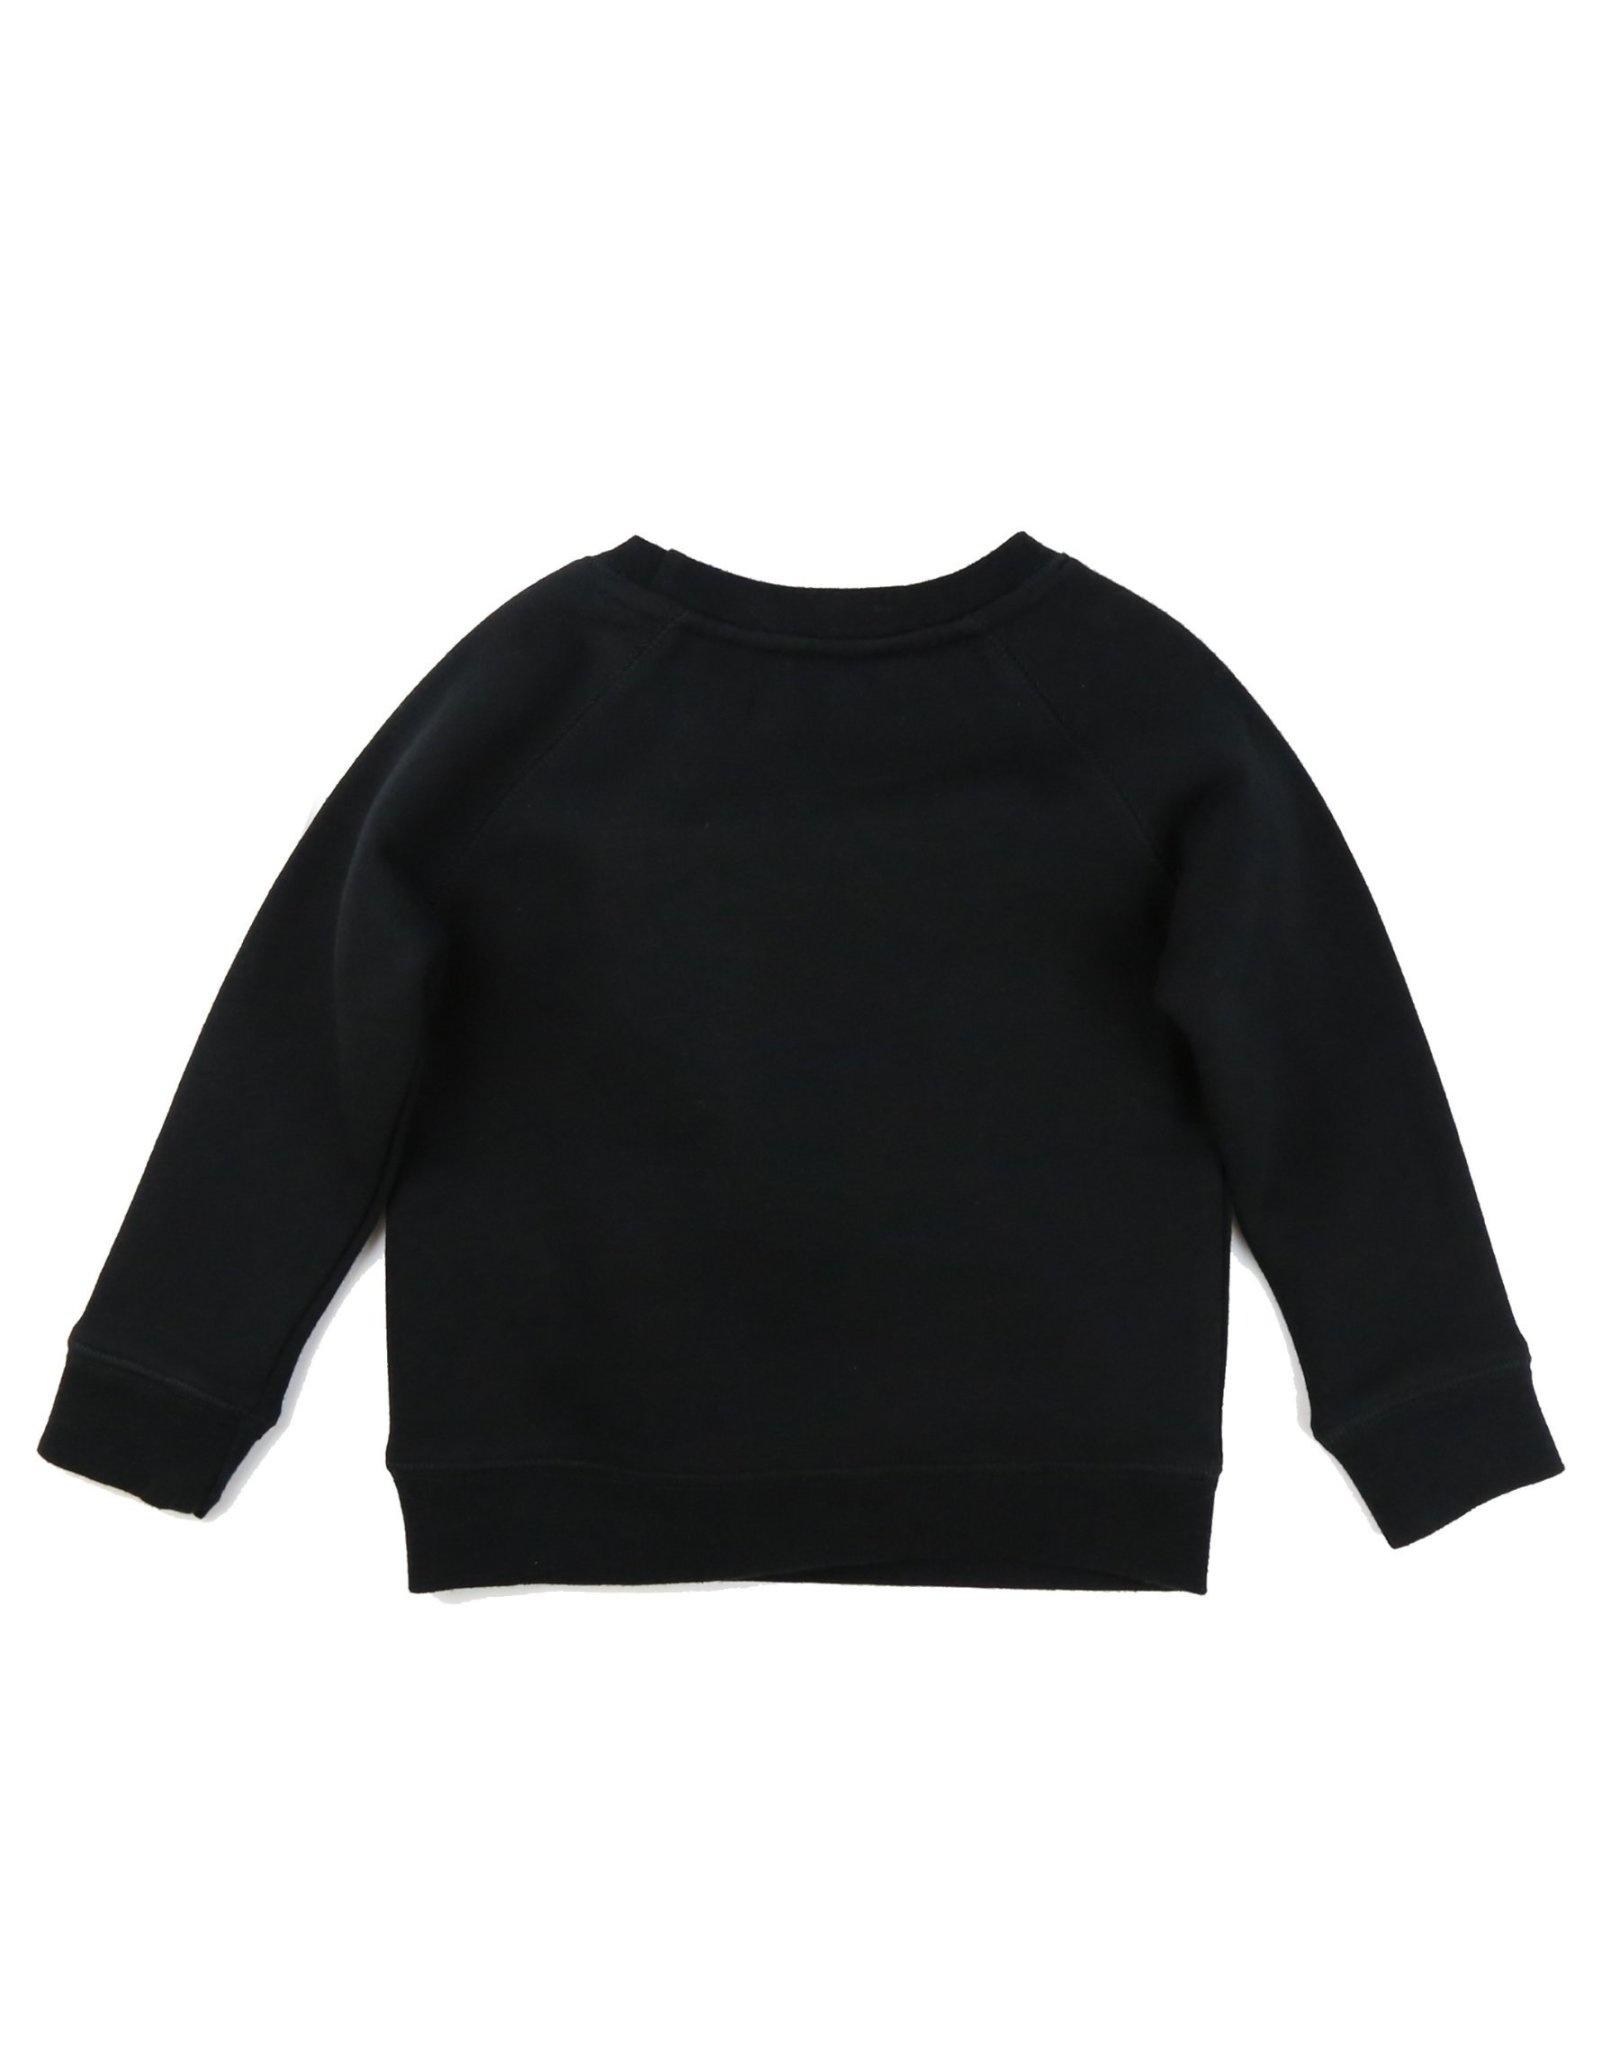 Brunette Boss Baby Kid Sweatshirt